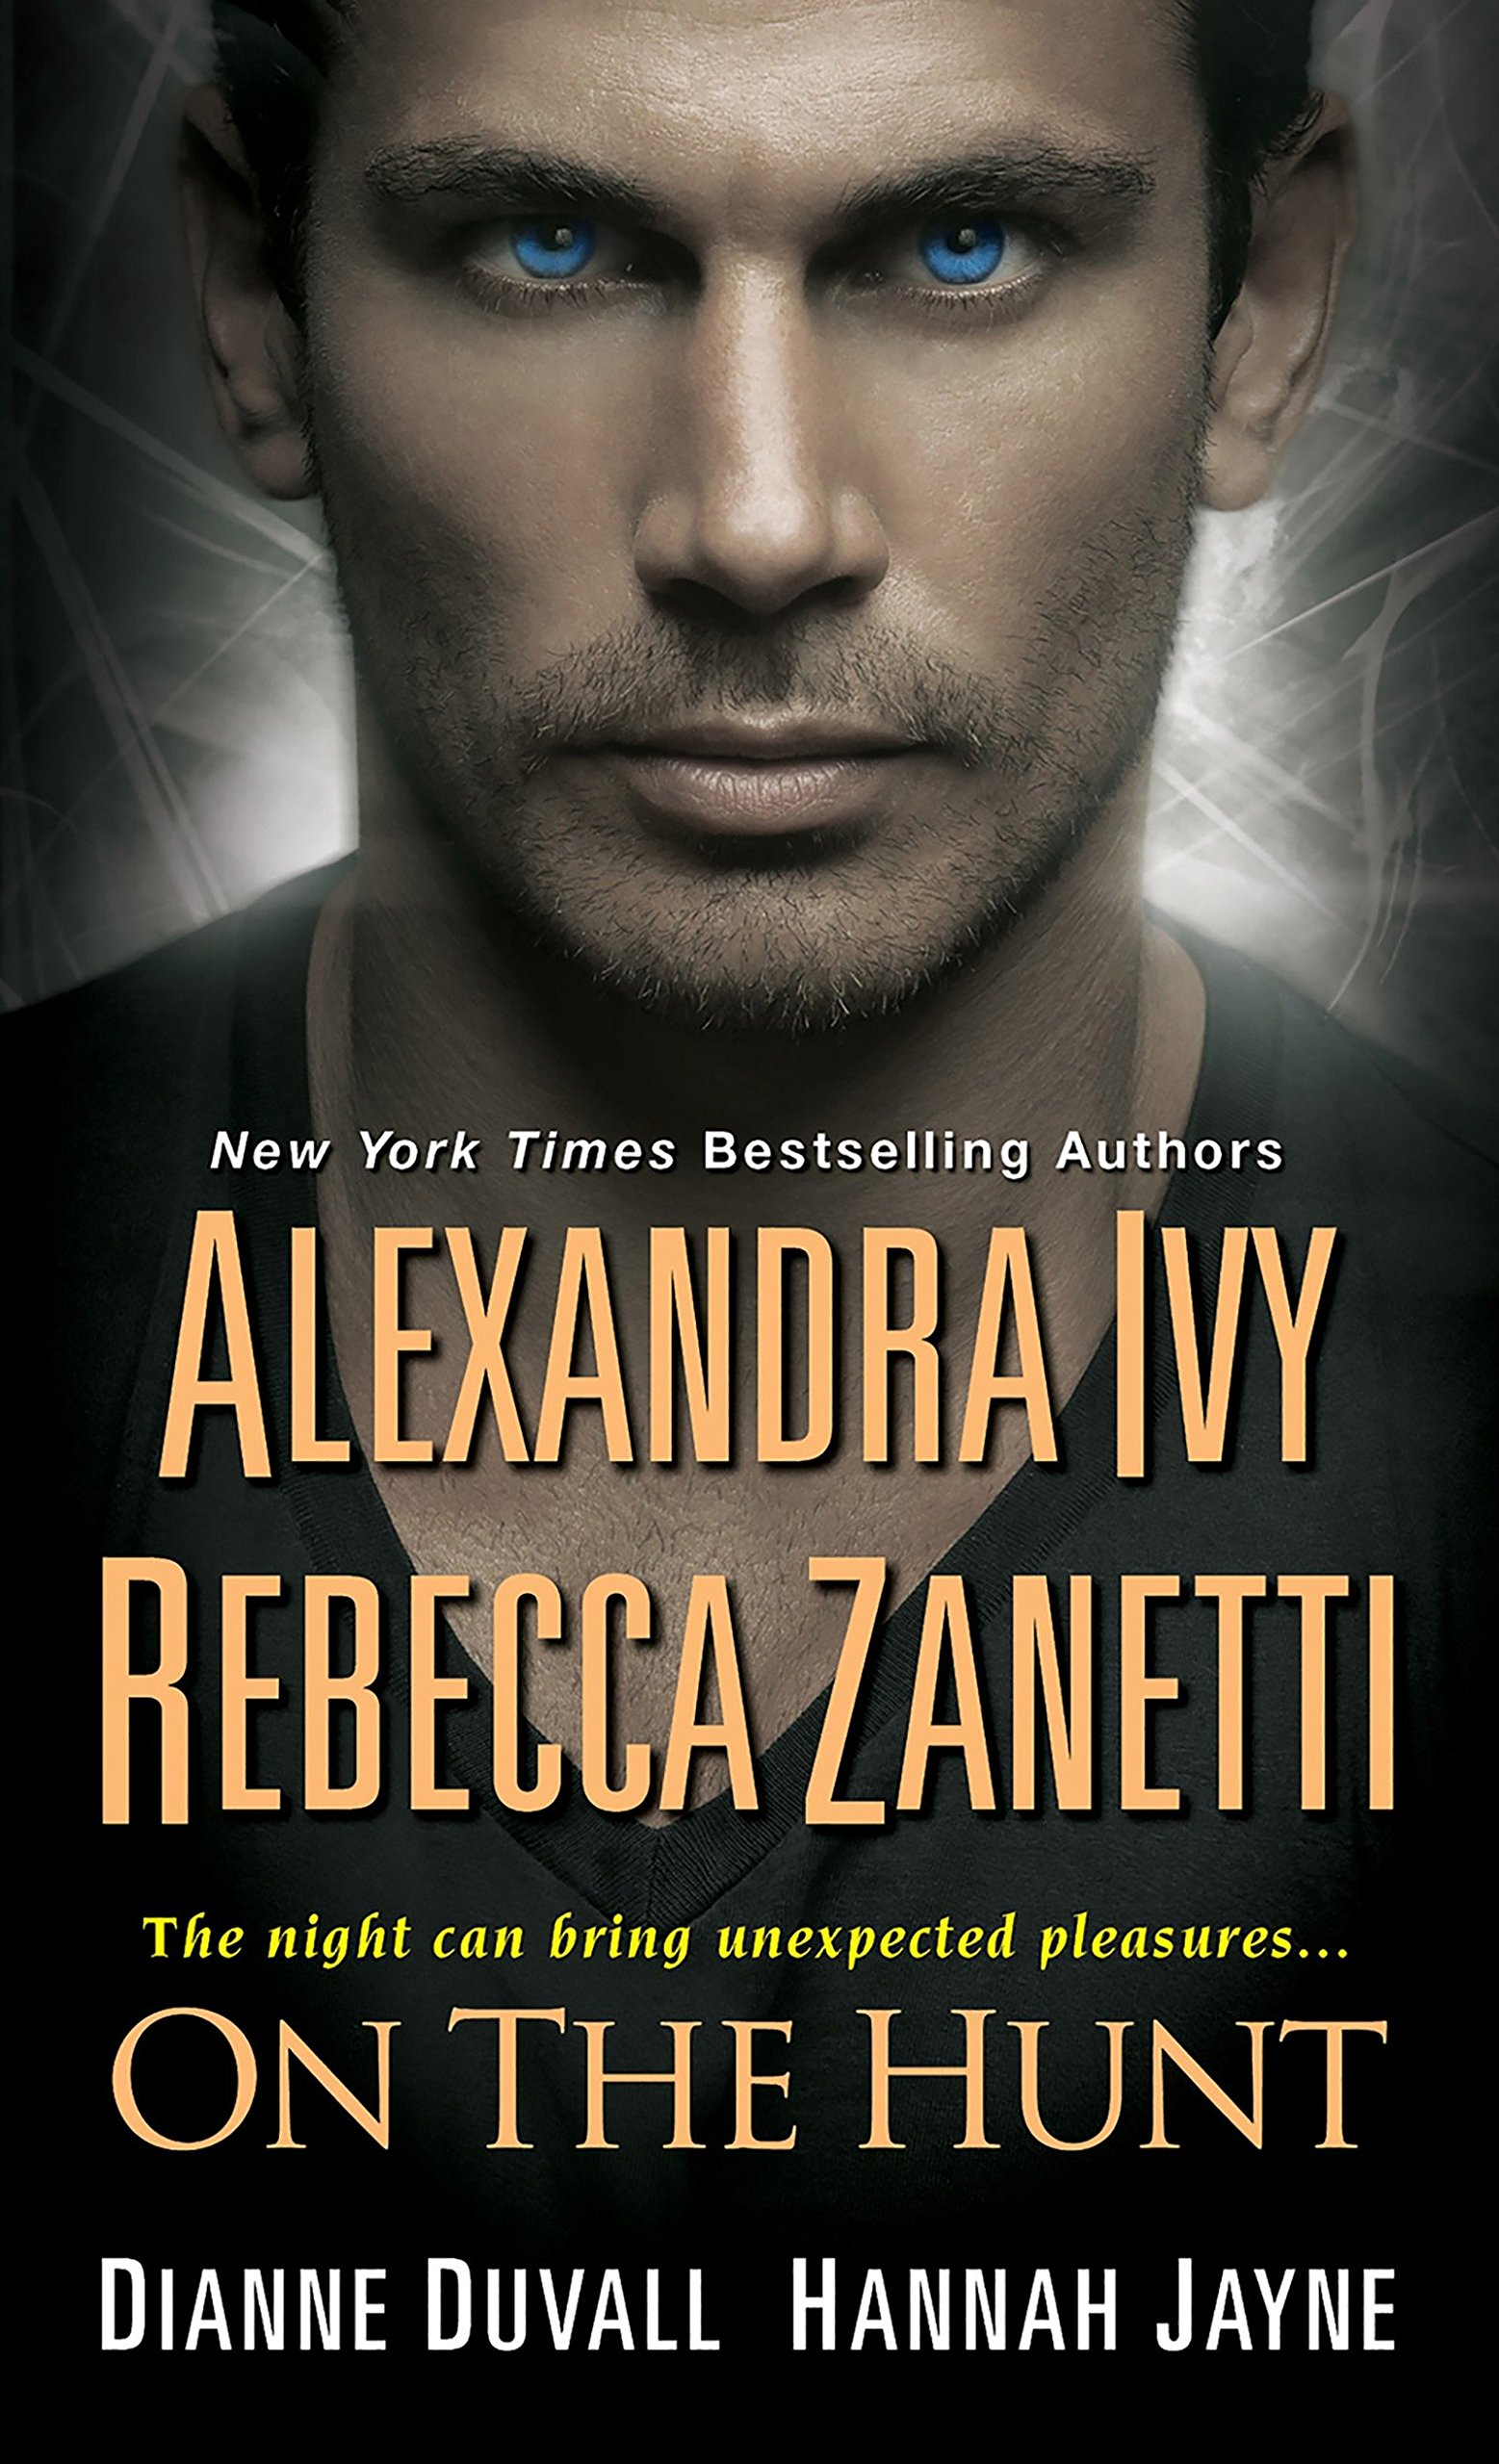 Alexandra Ivy: biography and creativity 82